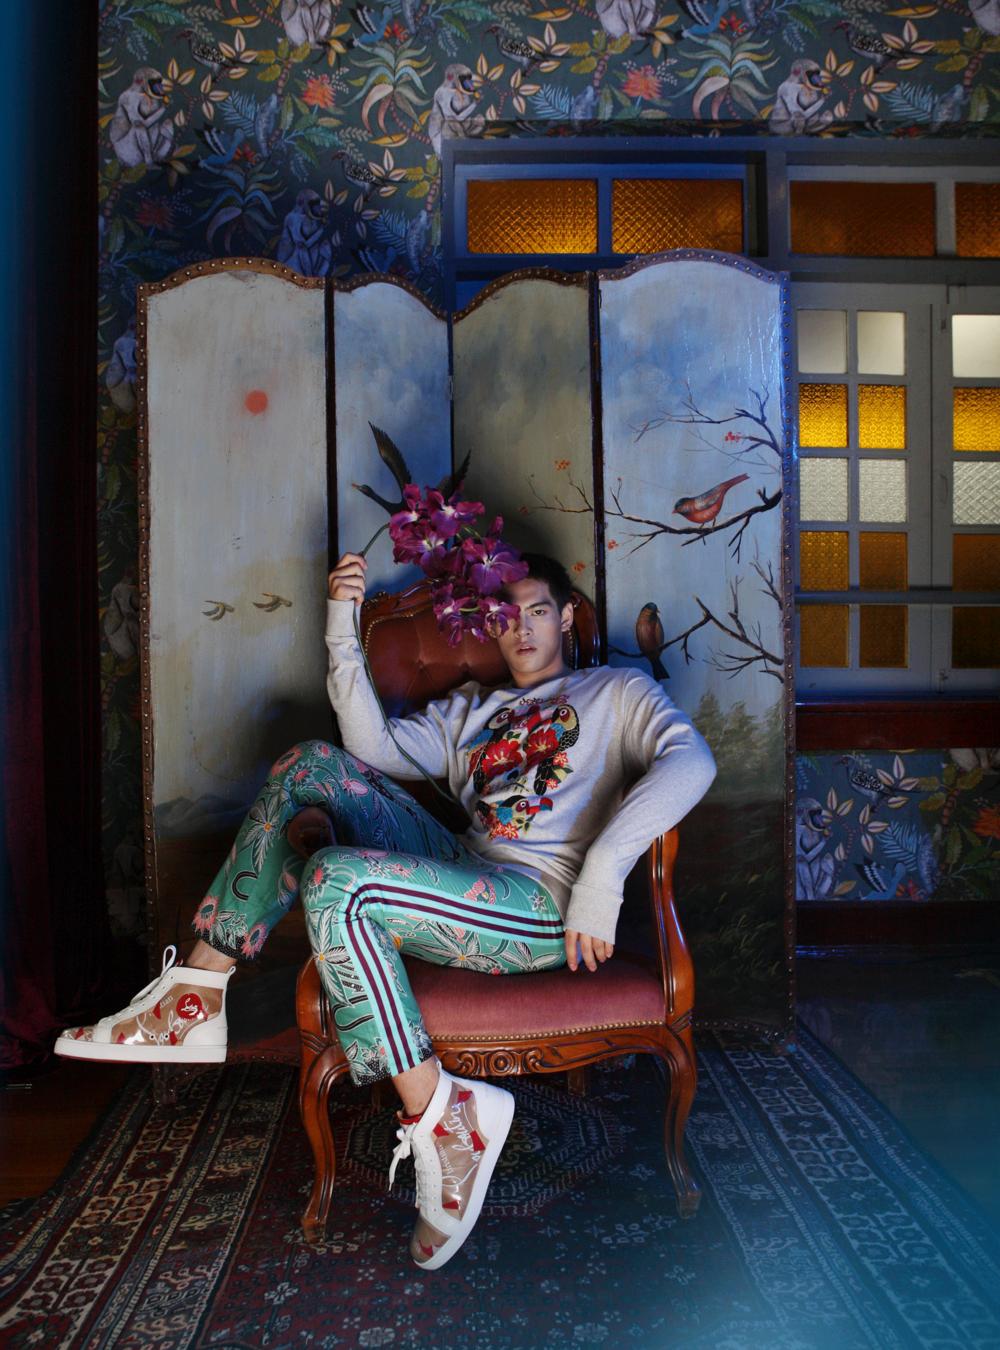 sweatshort : GINGER / pants : SARIT / shoes : Christian Louboutin